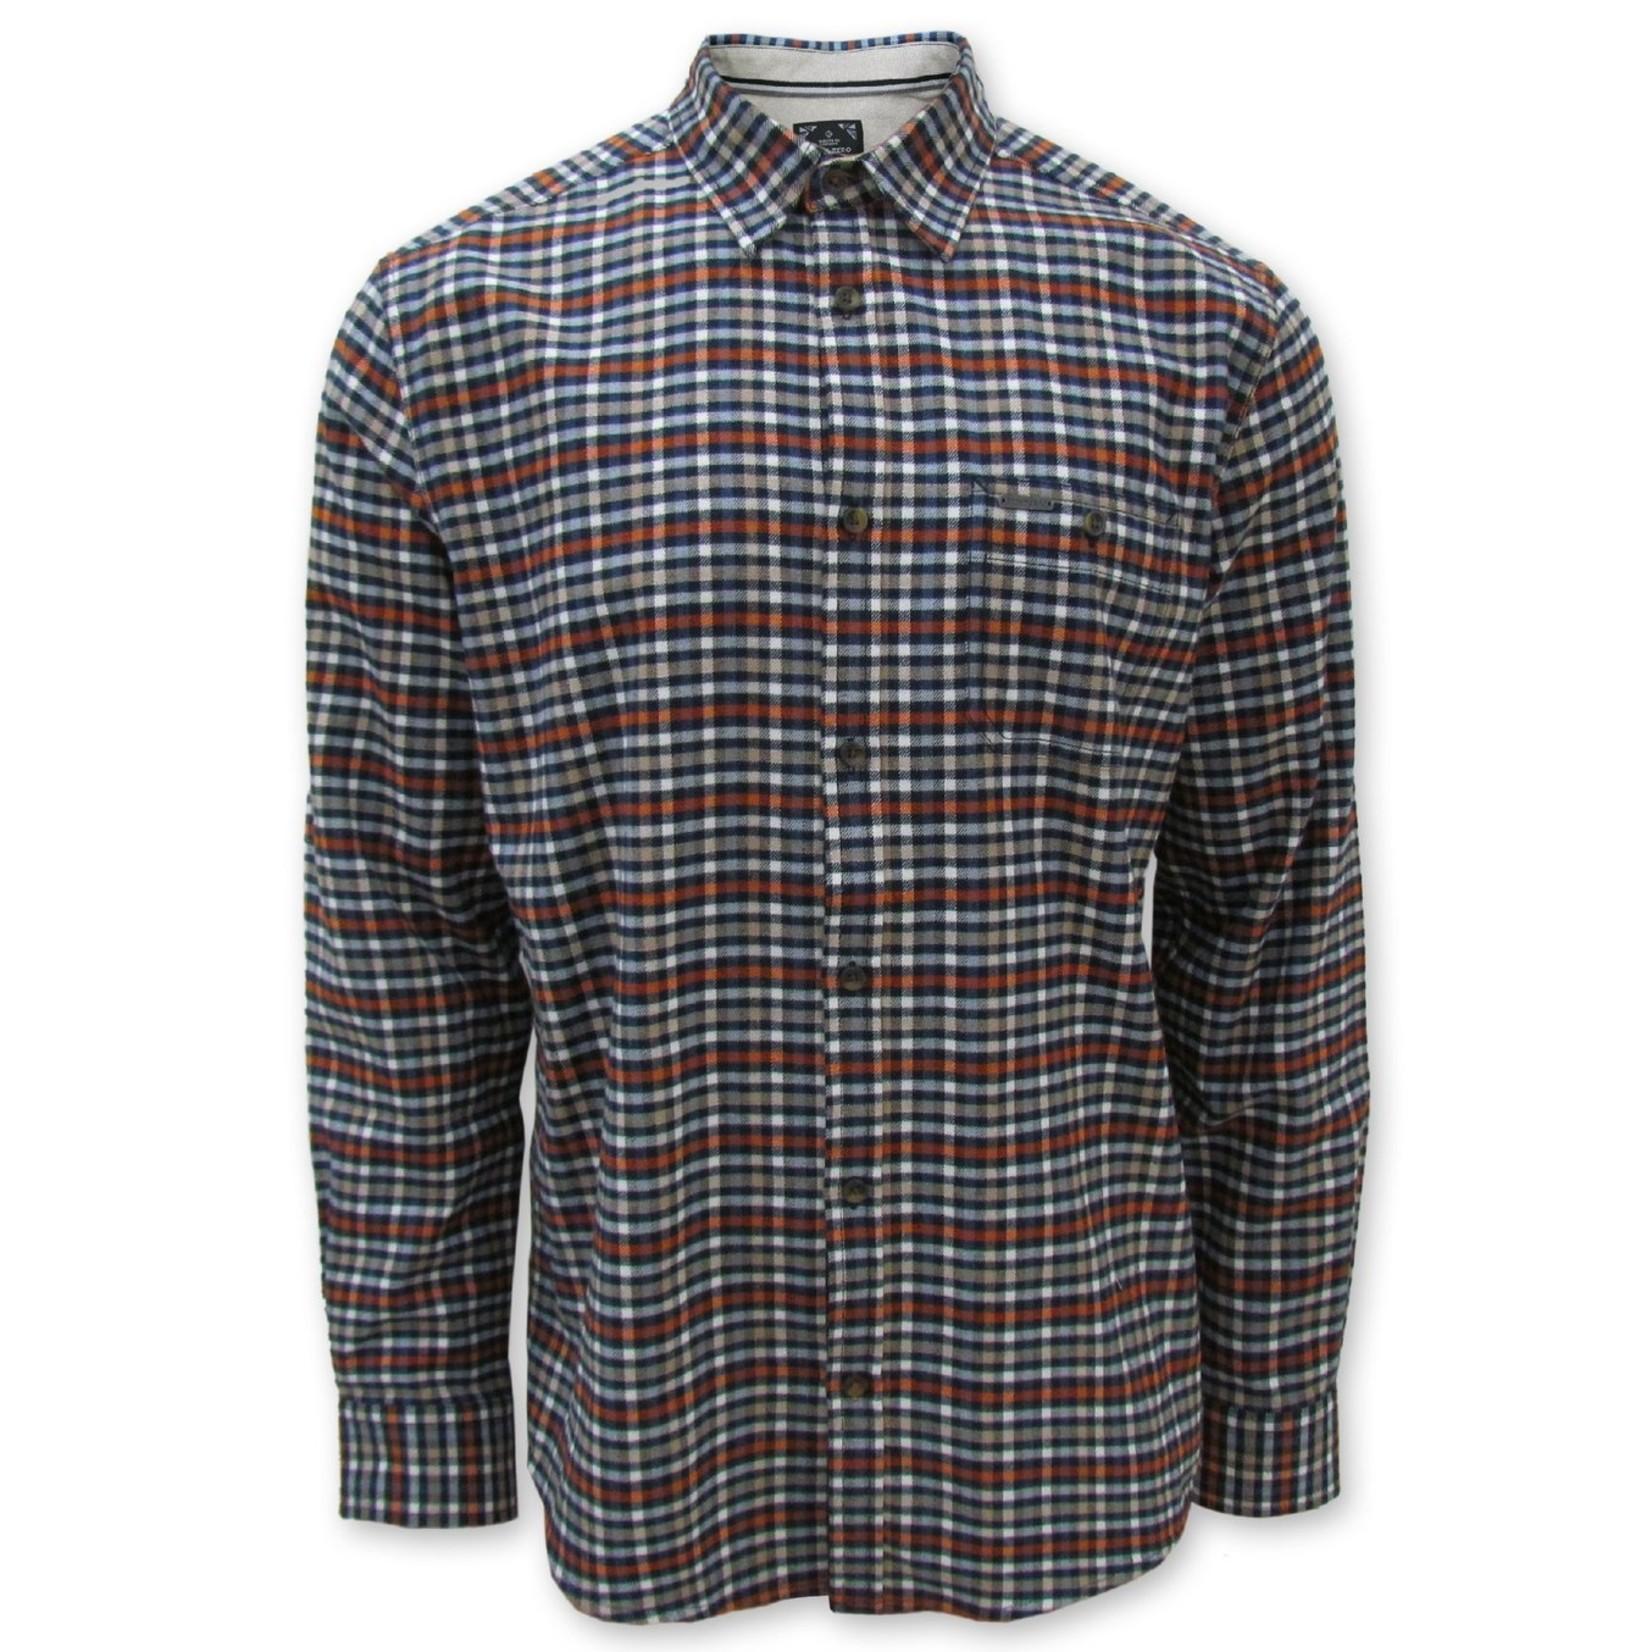 PointZero 7754560 Flannel Long-Sleeve